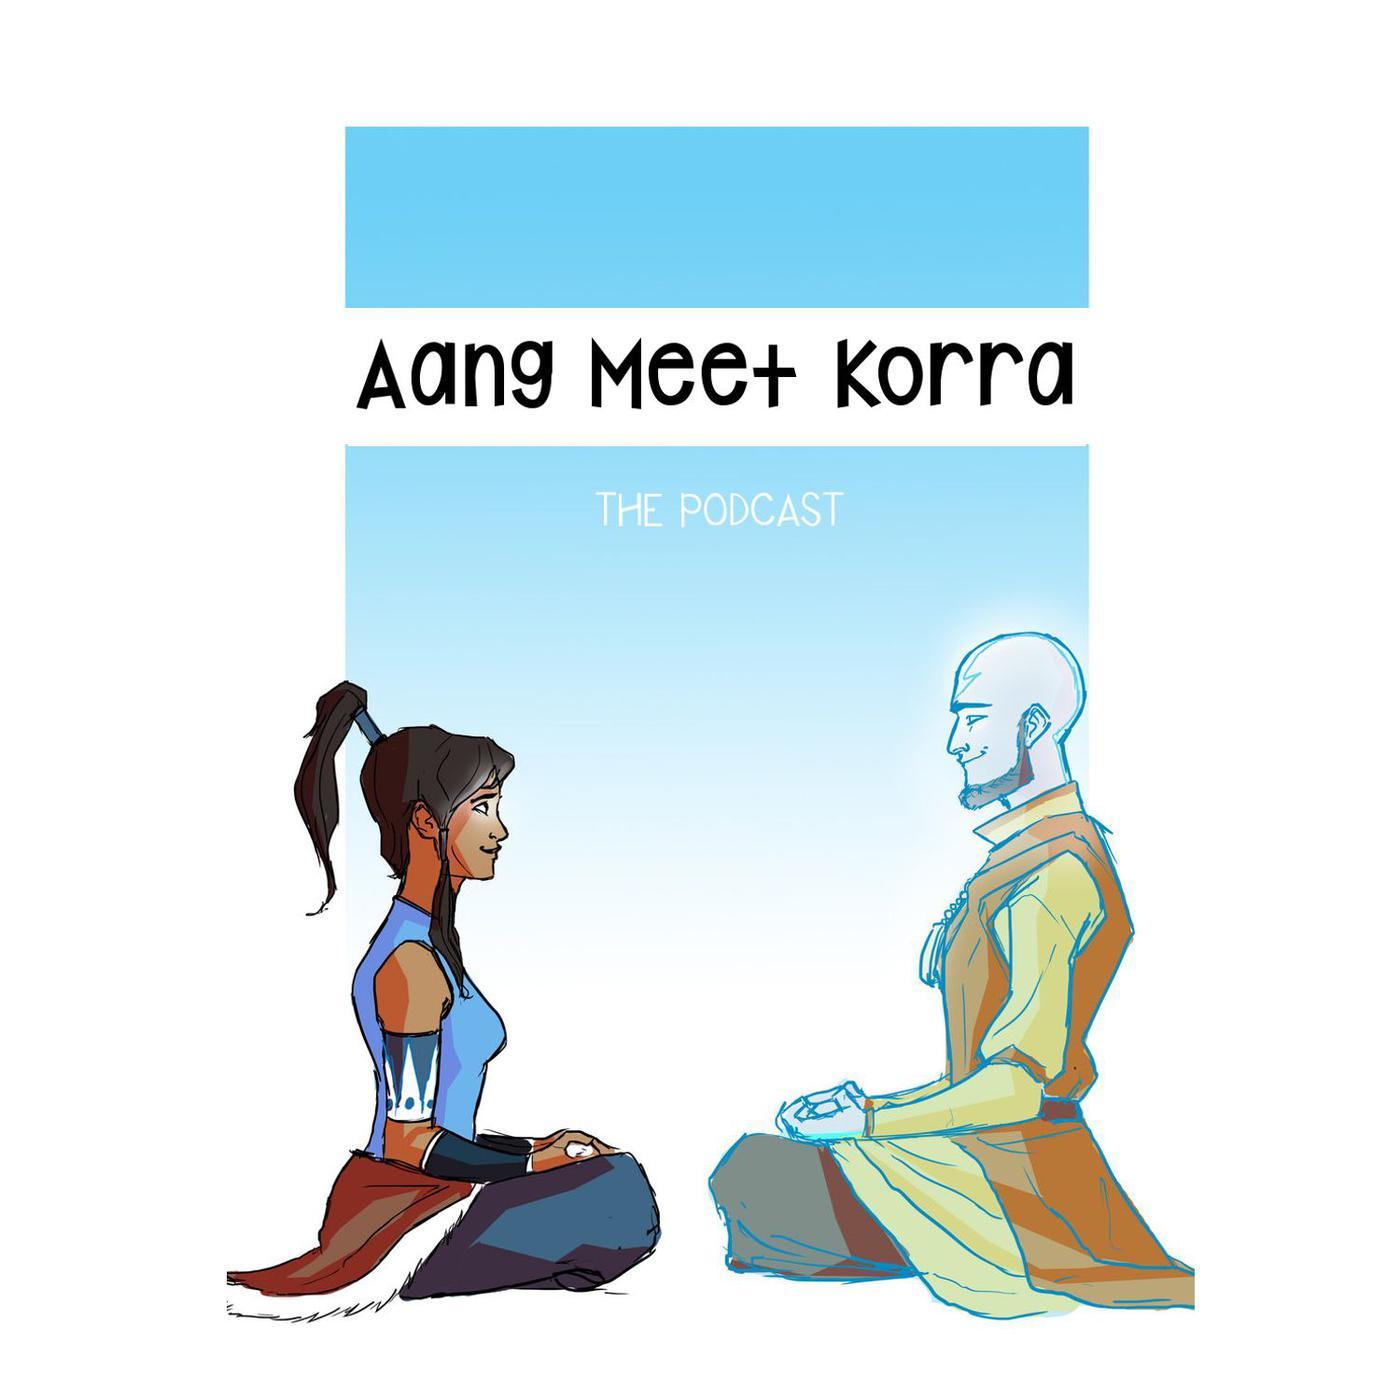 Aang Korra aang meet korra the podcast - byrnjae | listen notes